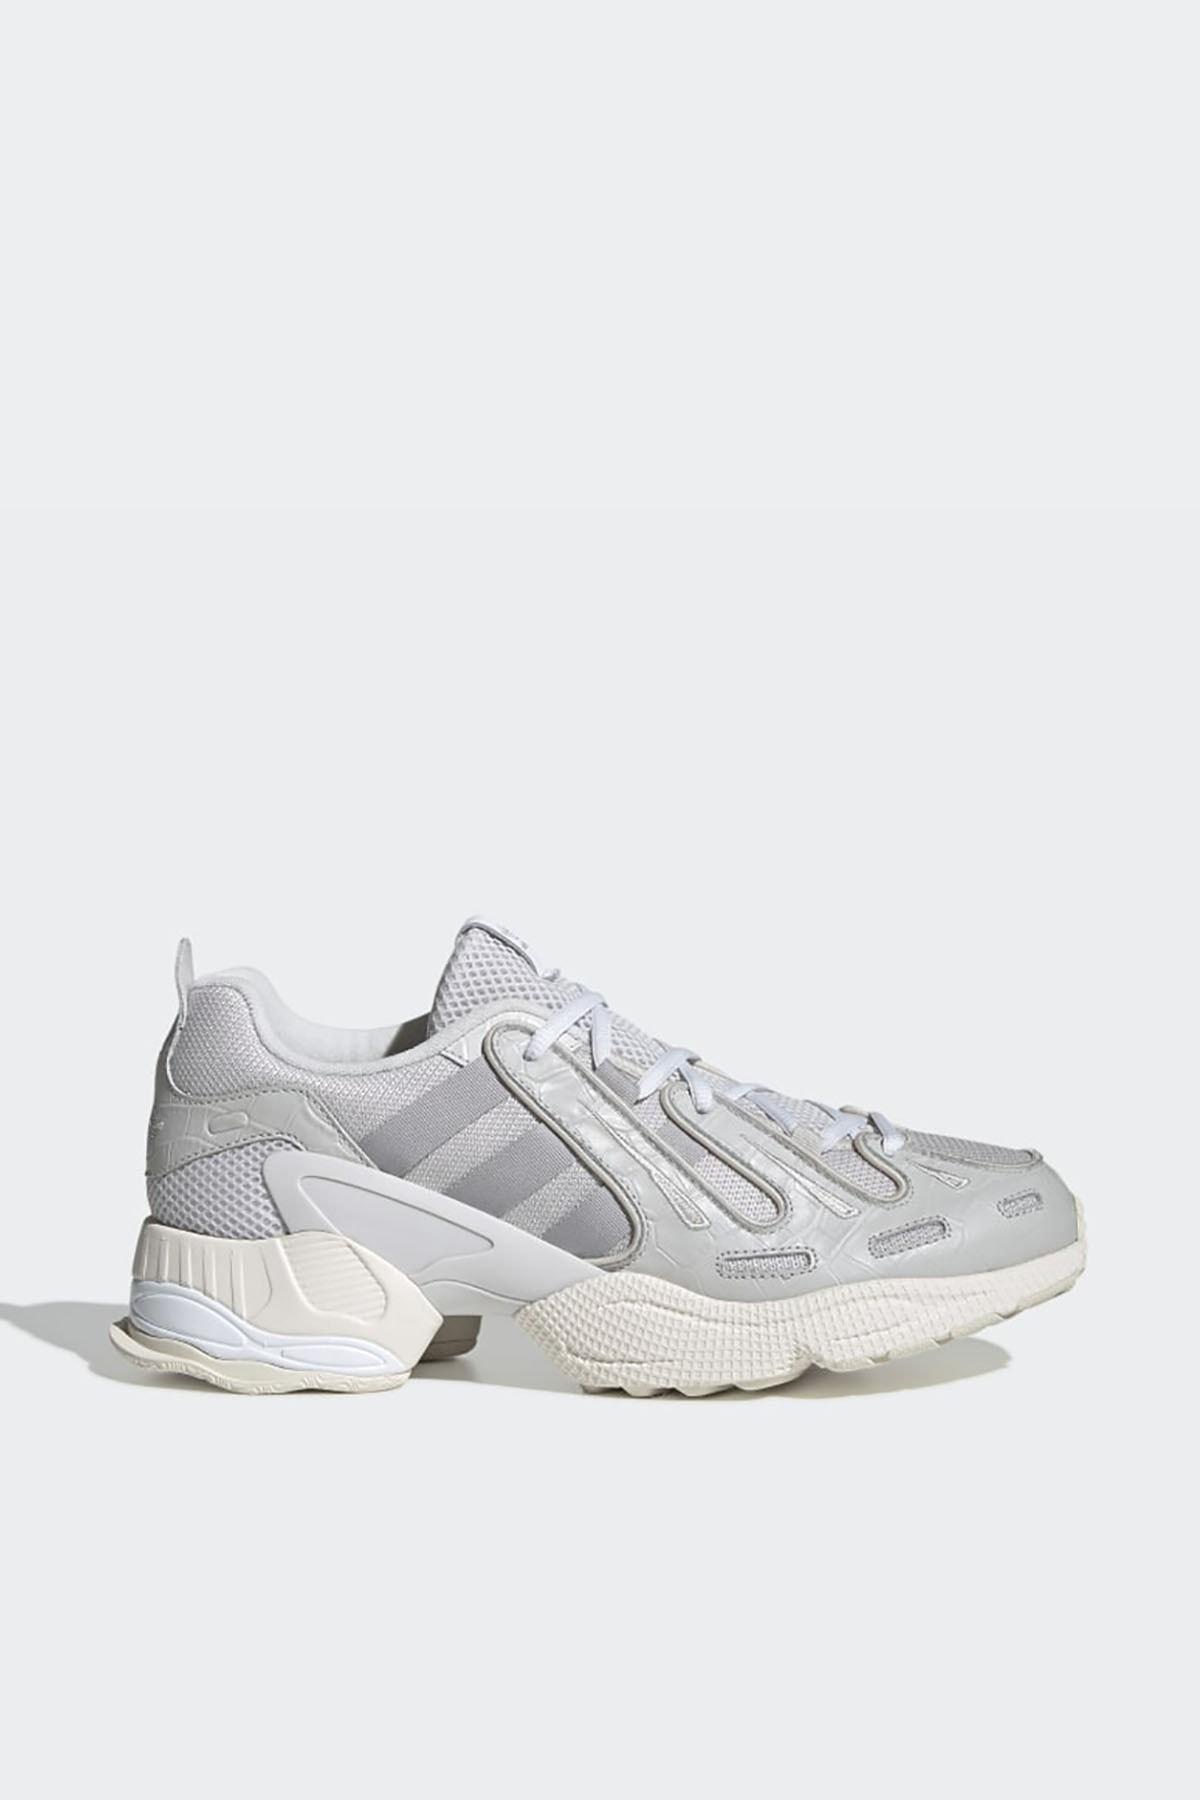 adidas Erkek Spor Ayakkabı - Eqt Gazelle 1